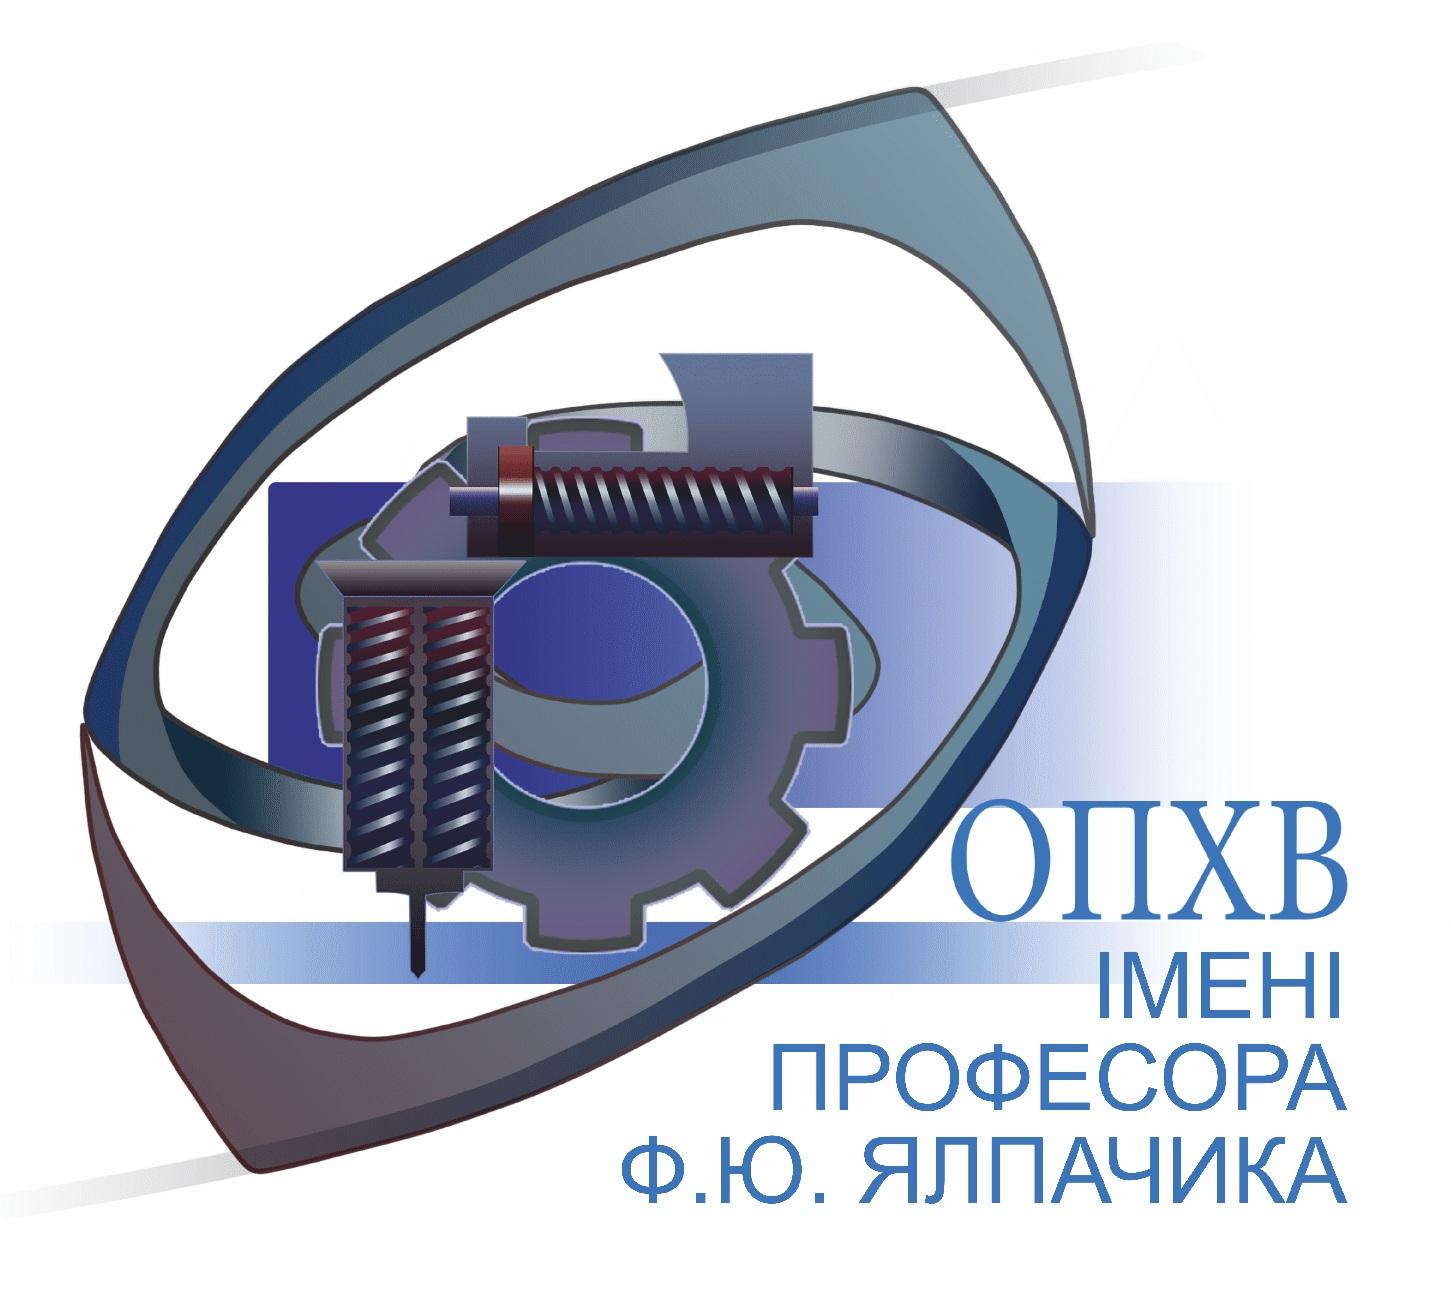 герб ОПХВ